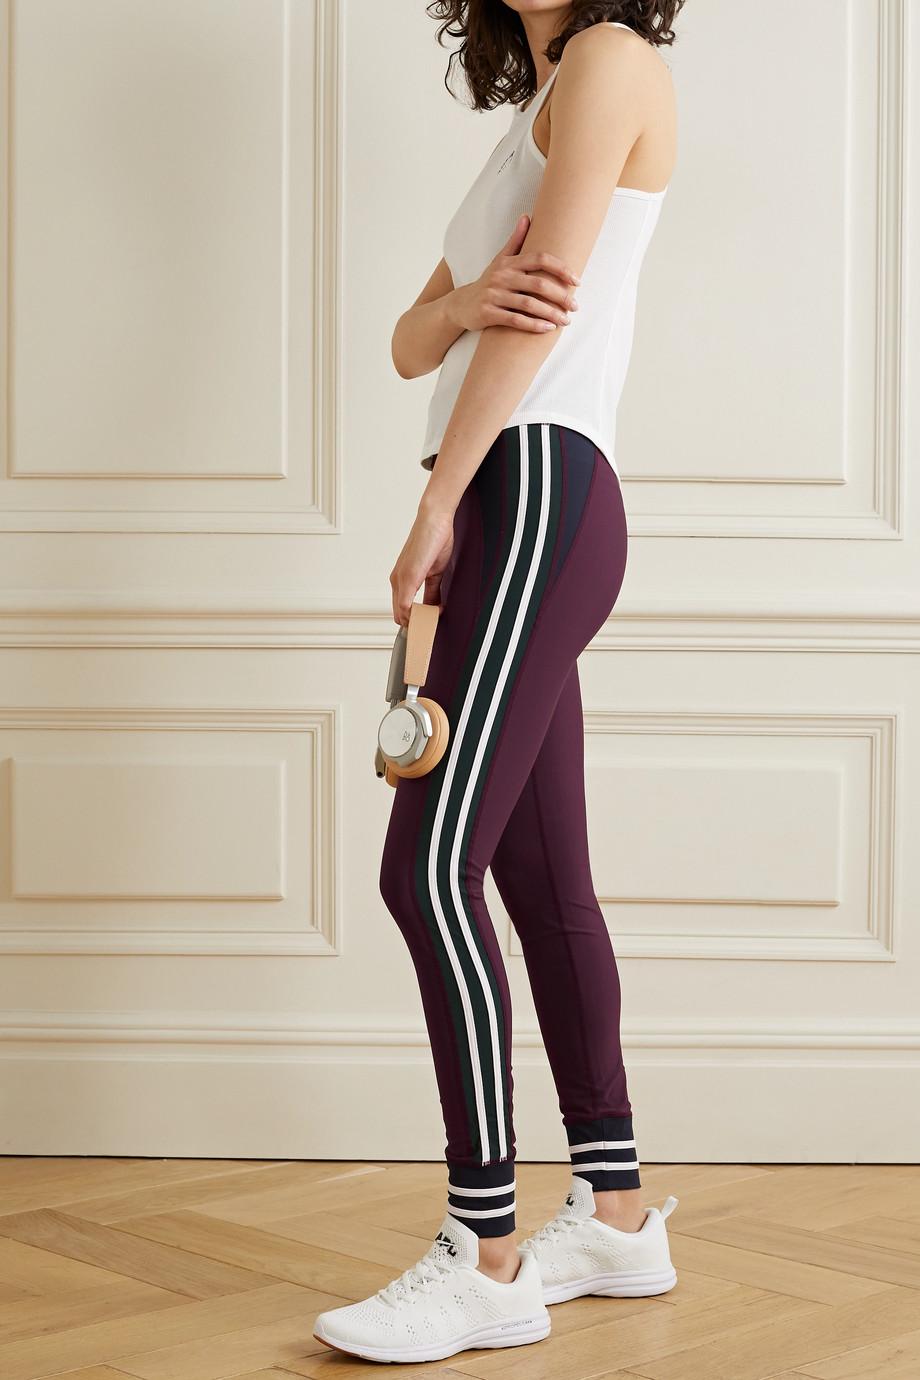 The Upside Heritage color-block striped stretch leggings